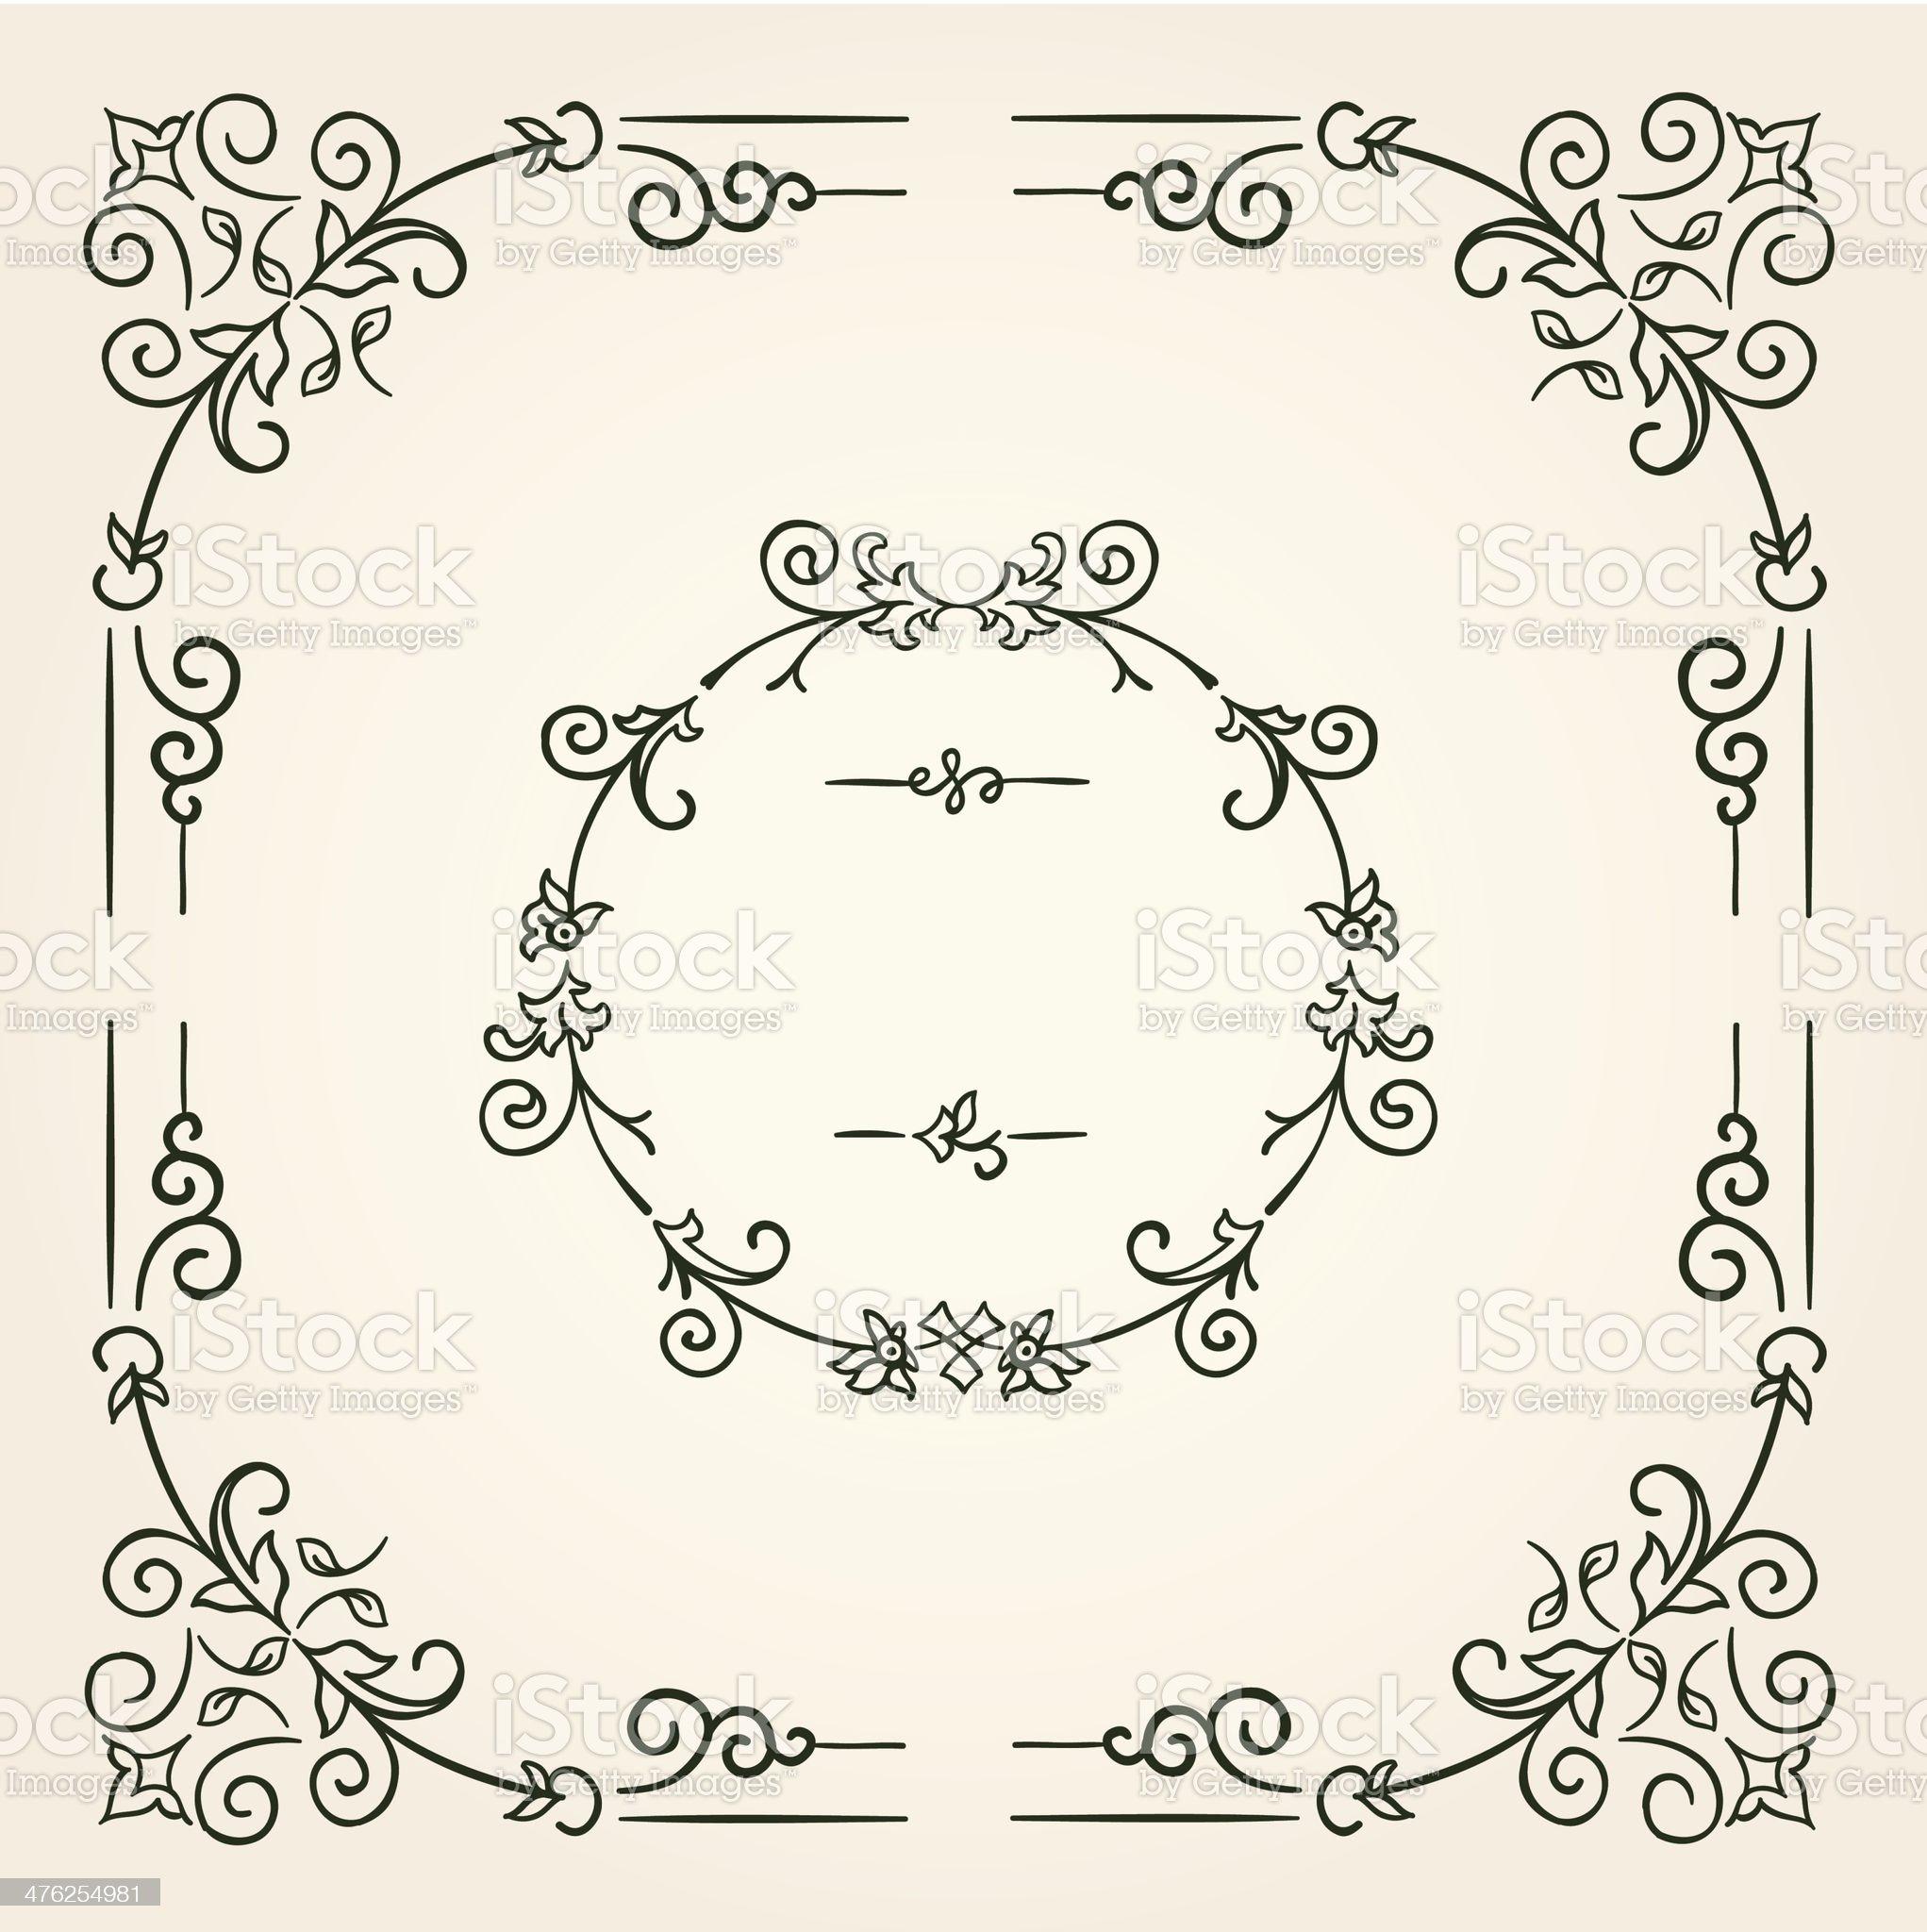 Ornamental vintage rectangular border frame royalty-free stock vector art